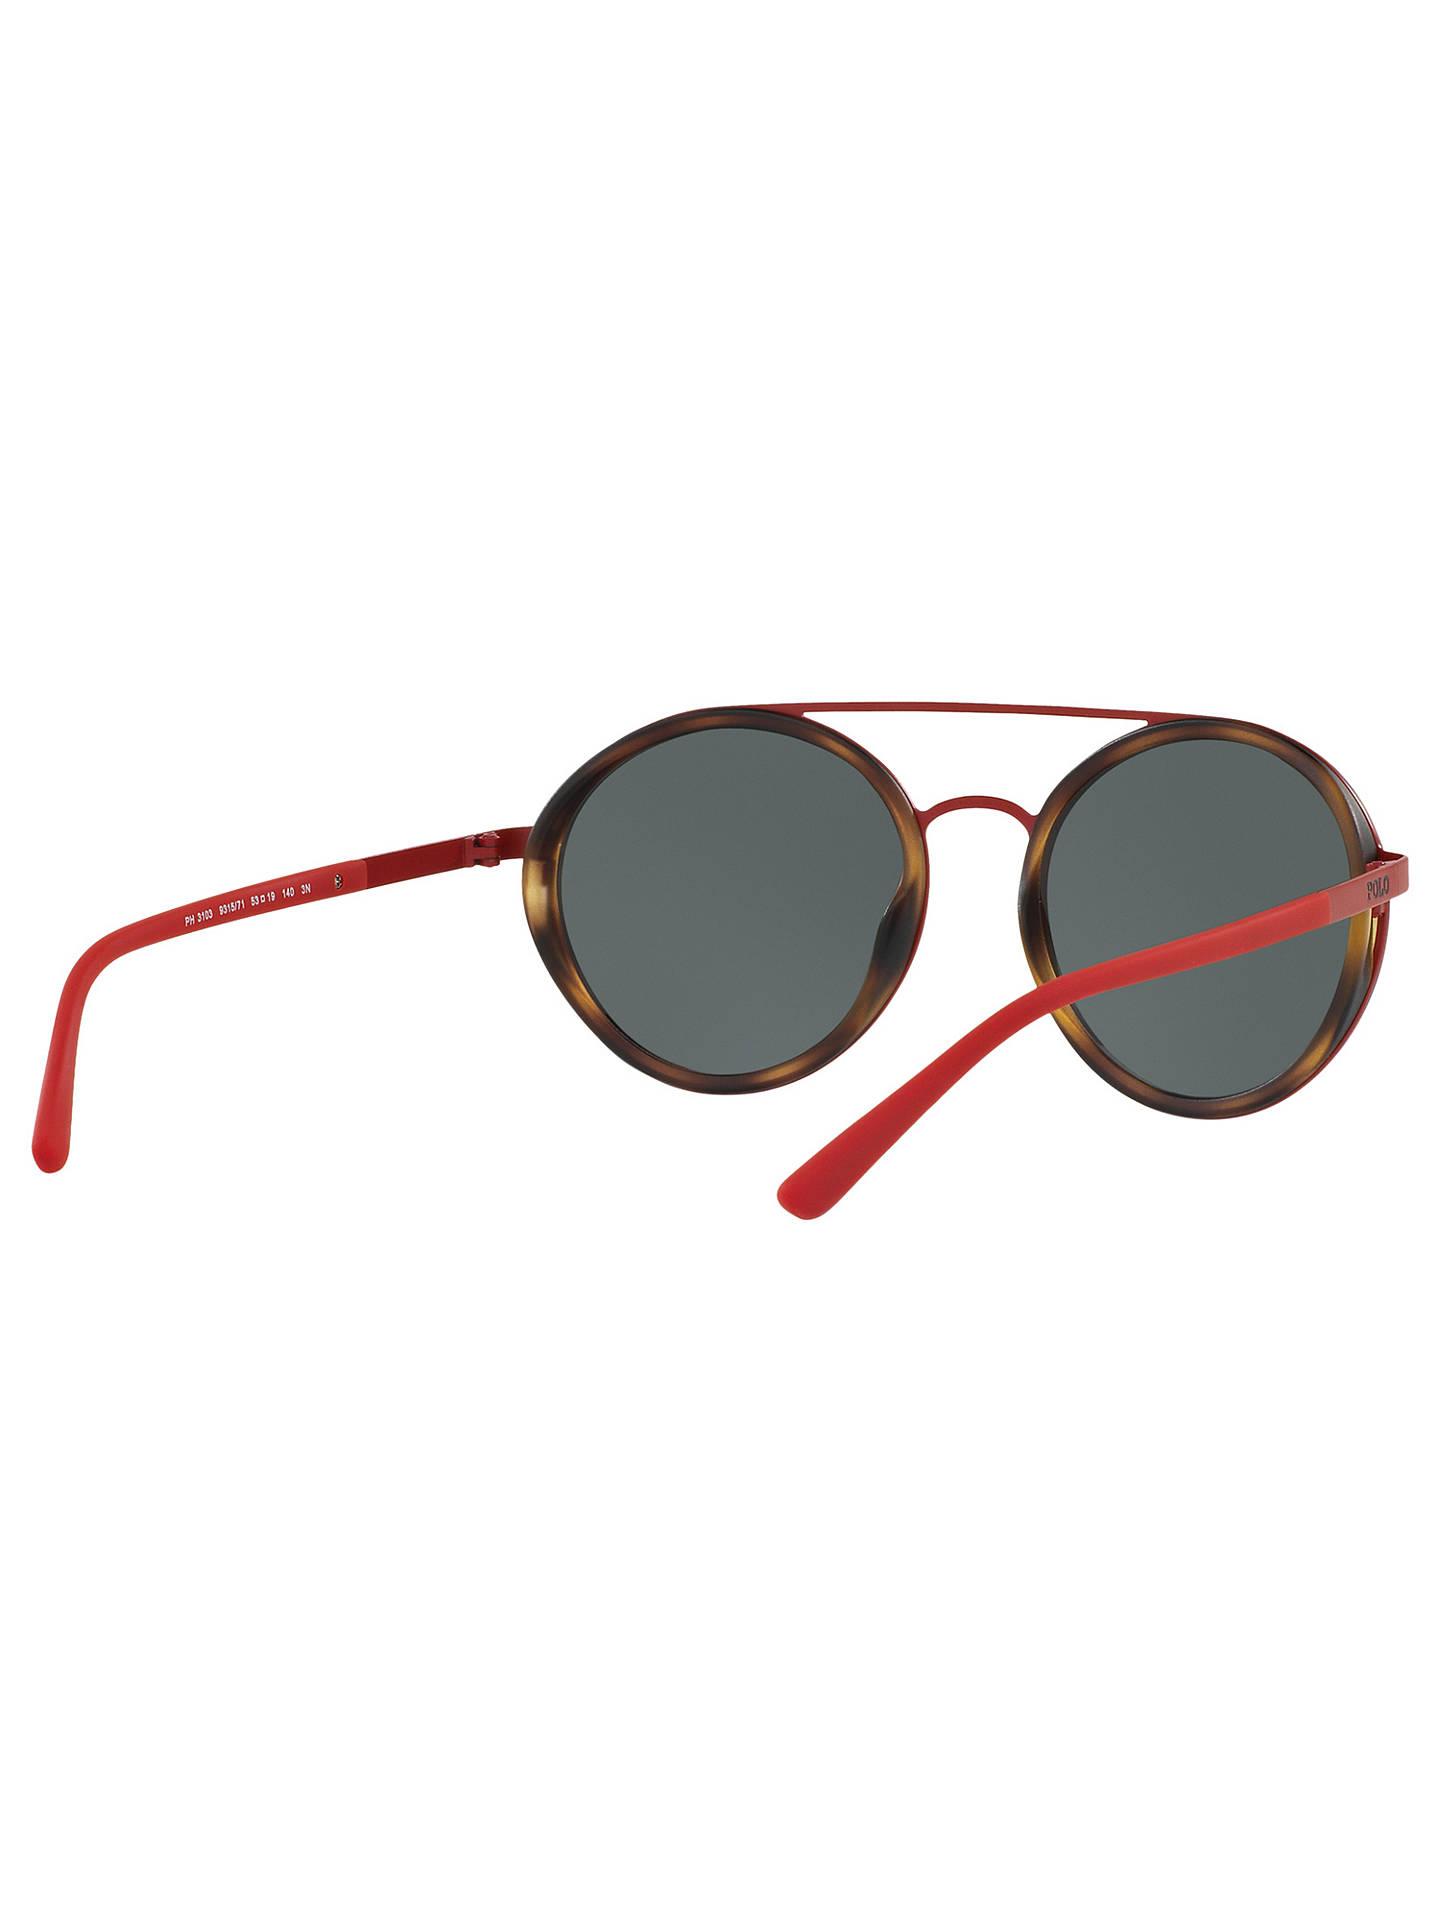 28f9c032c ... Buy Polo Ralph Lauren PH3103 Round Sunglasses, Red Online at  johnlewis.com ...